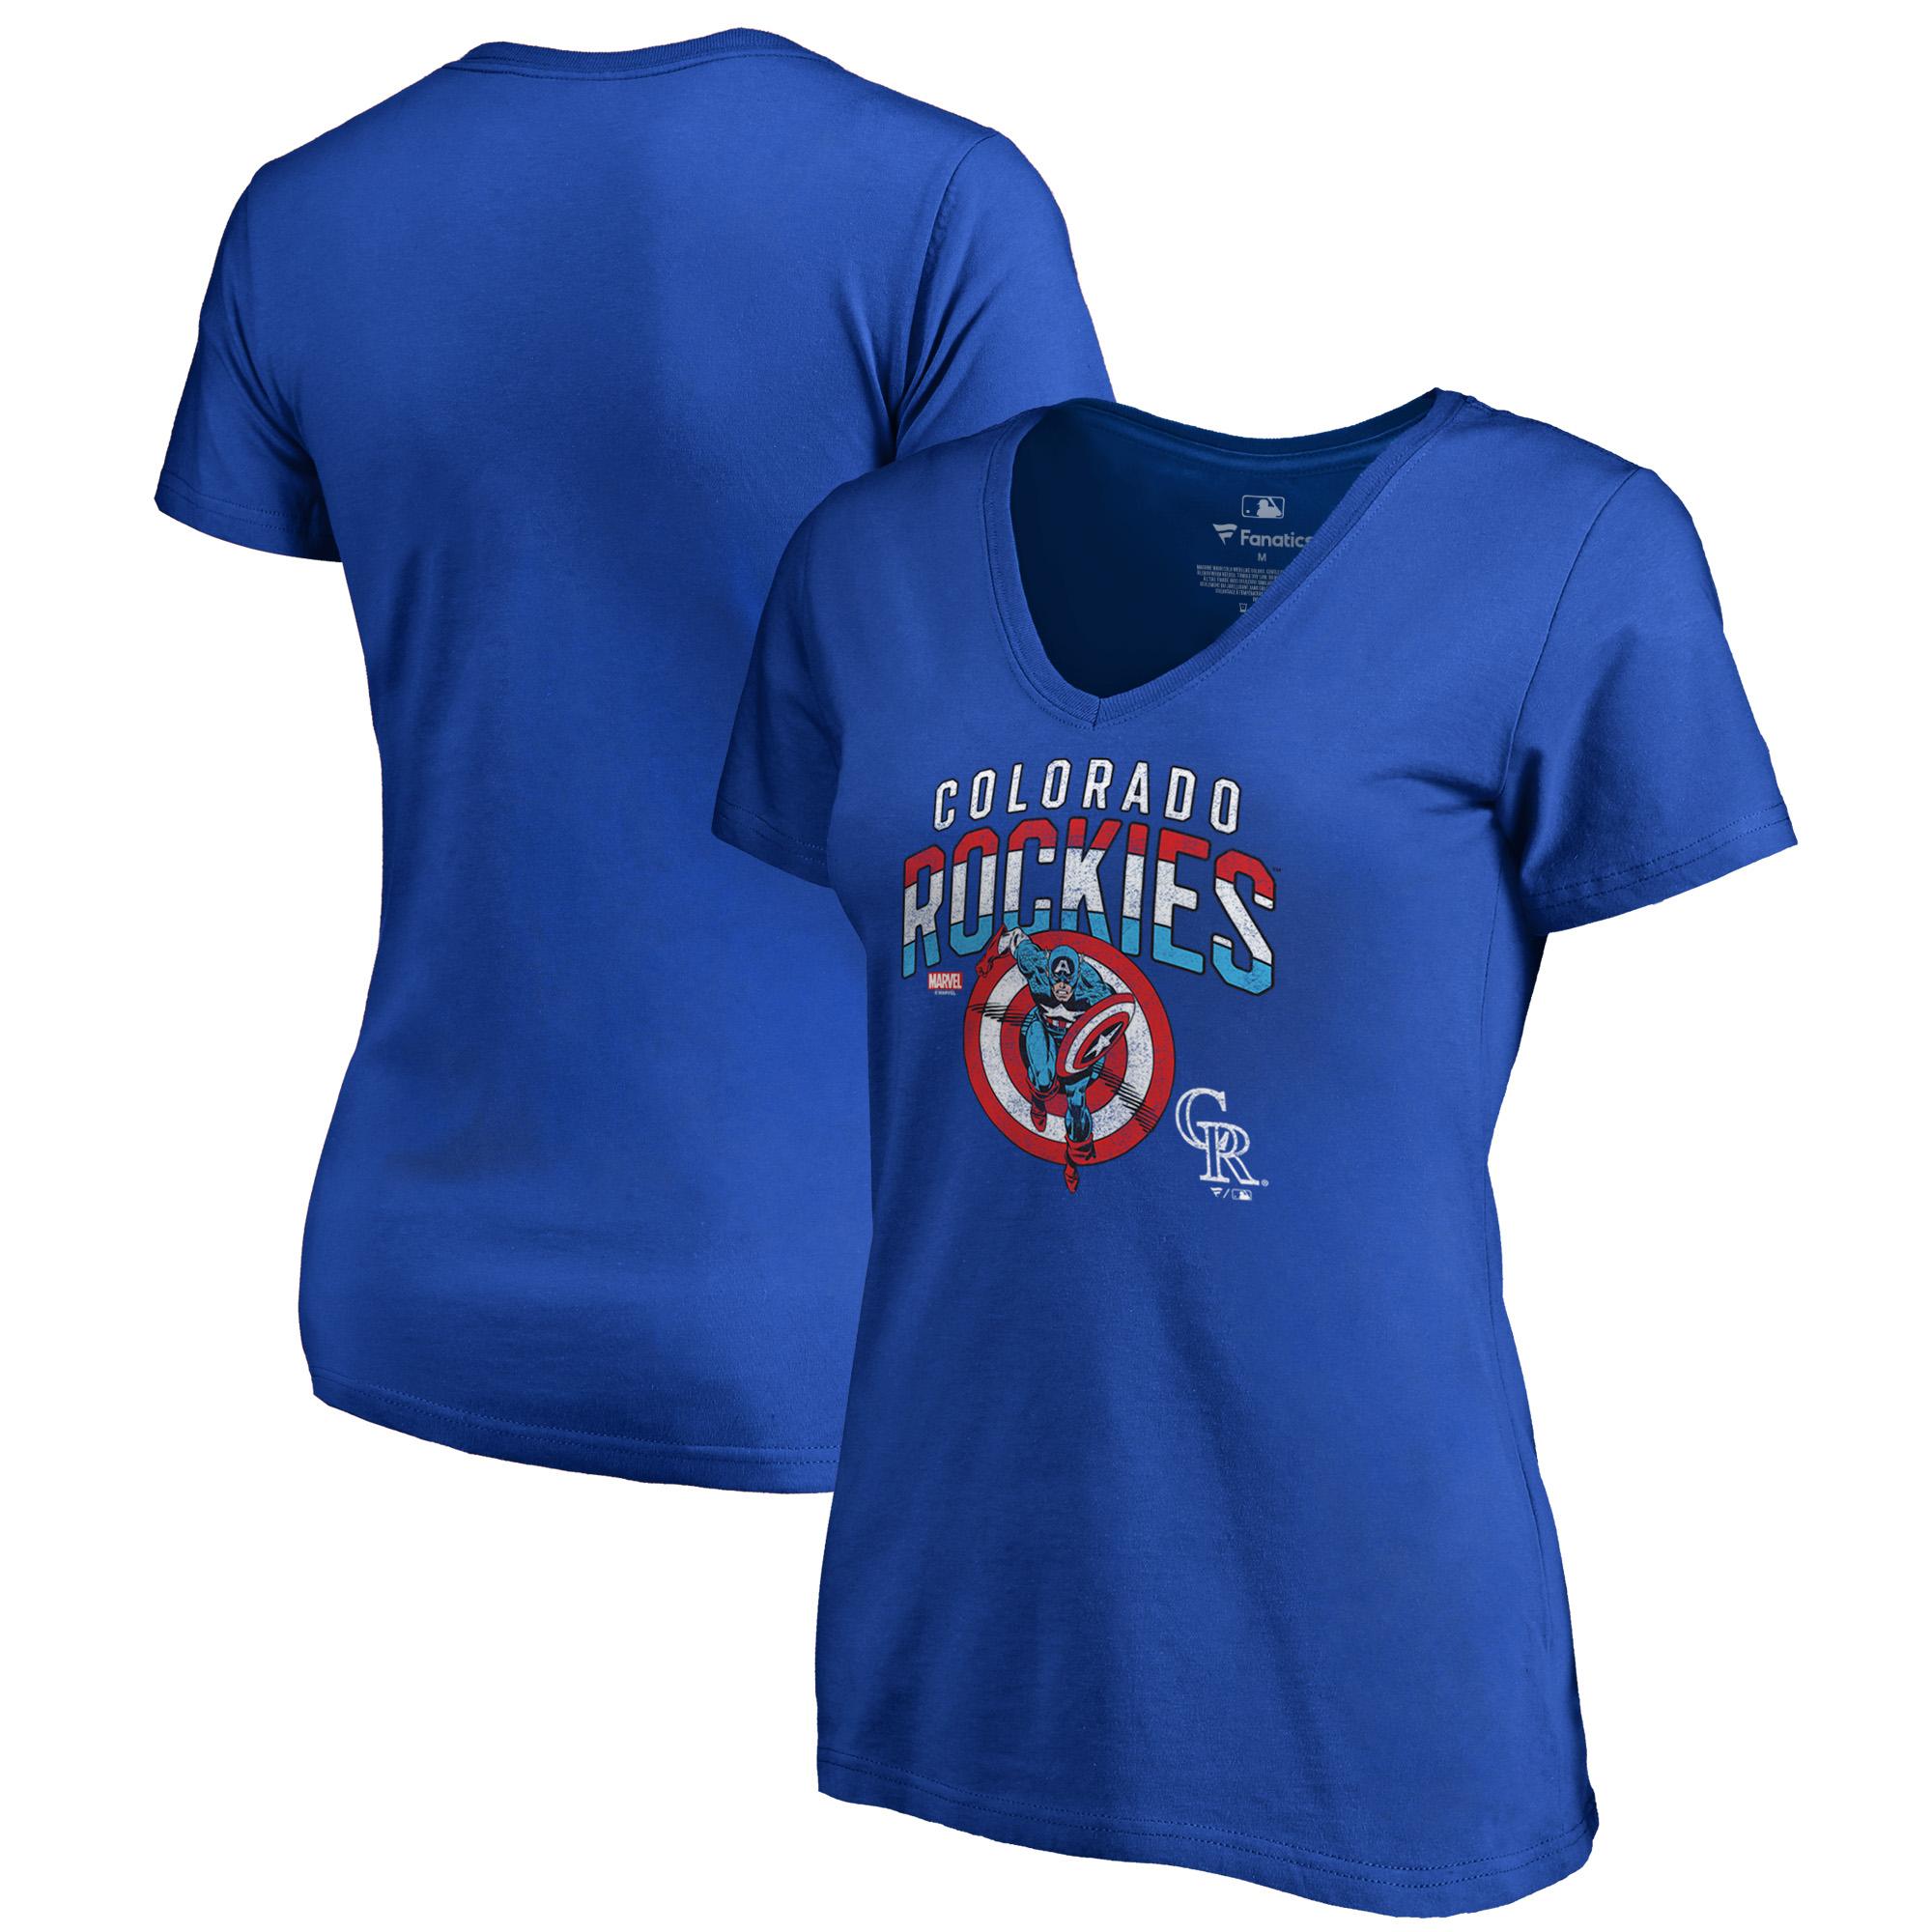 Colorado Rockies Fanatics Branded Women's MLB Marvel Captain's Shield V-Neck T-Shirt - Royal